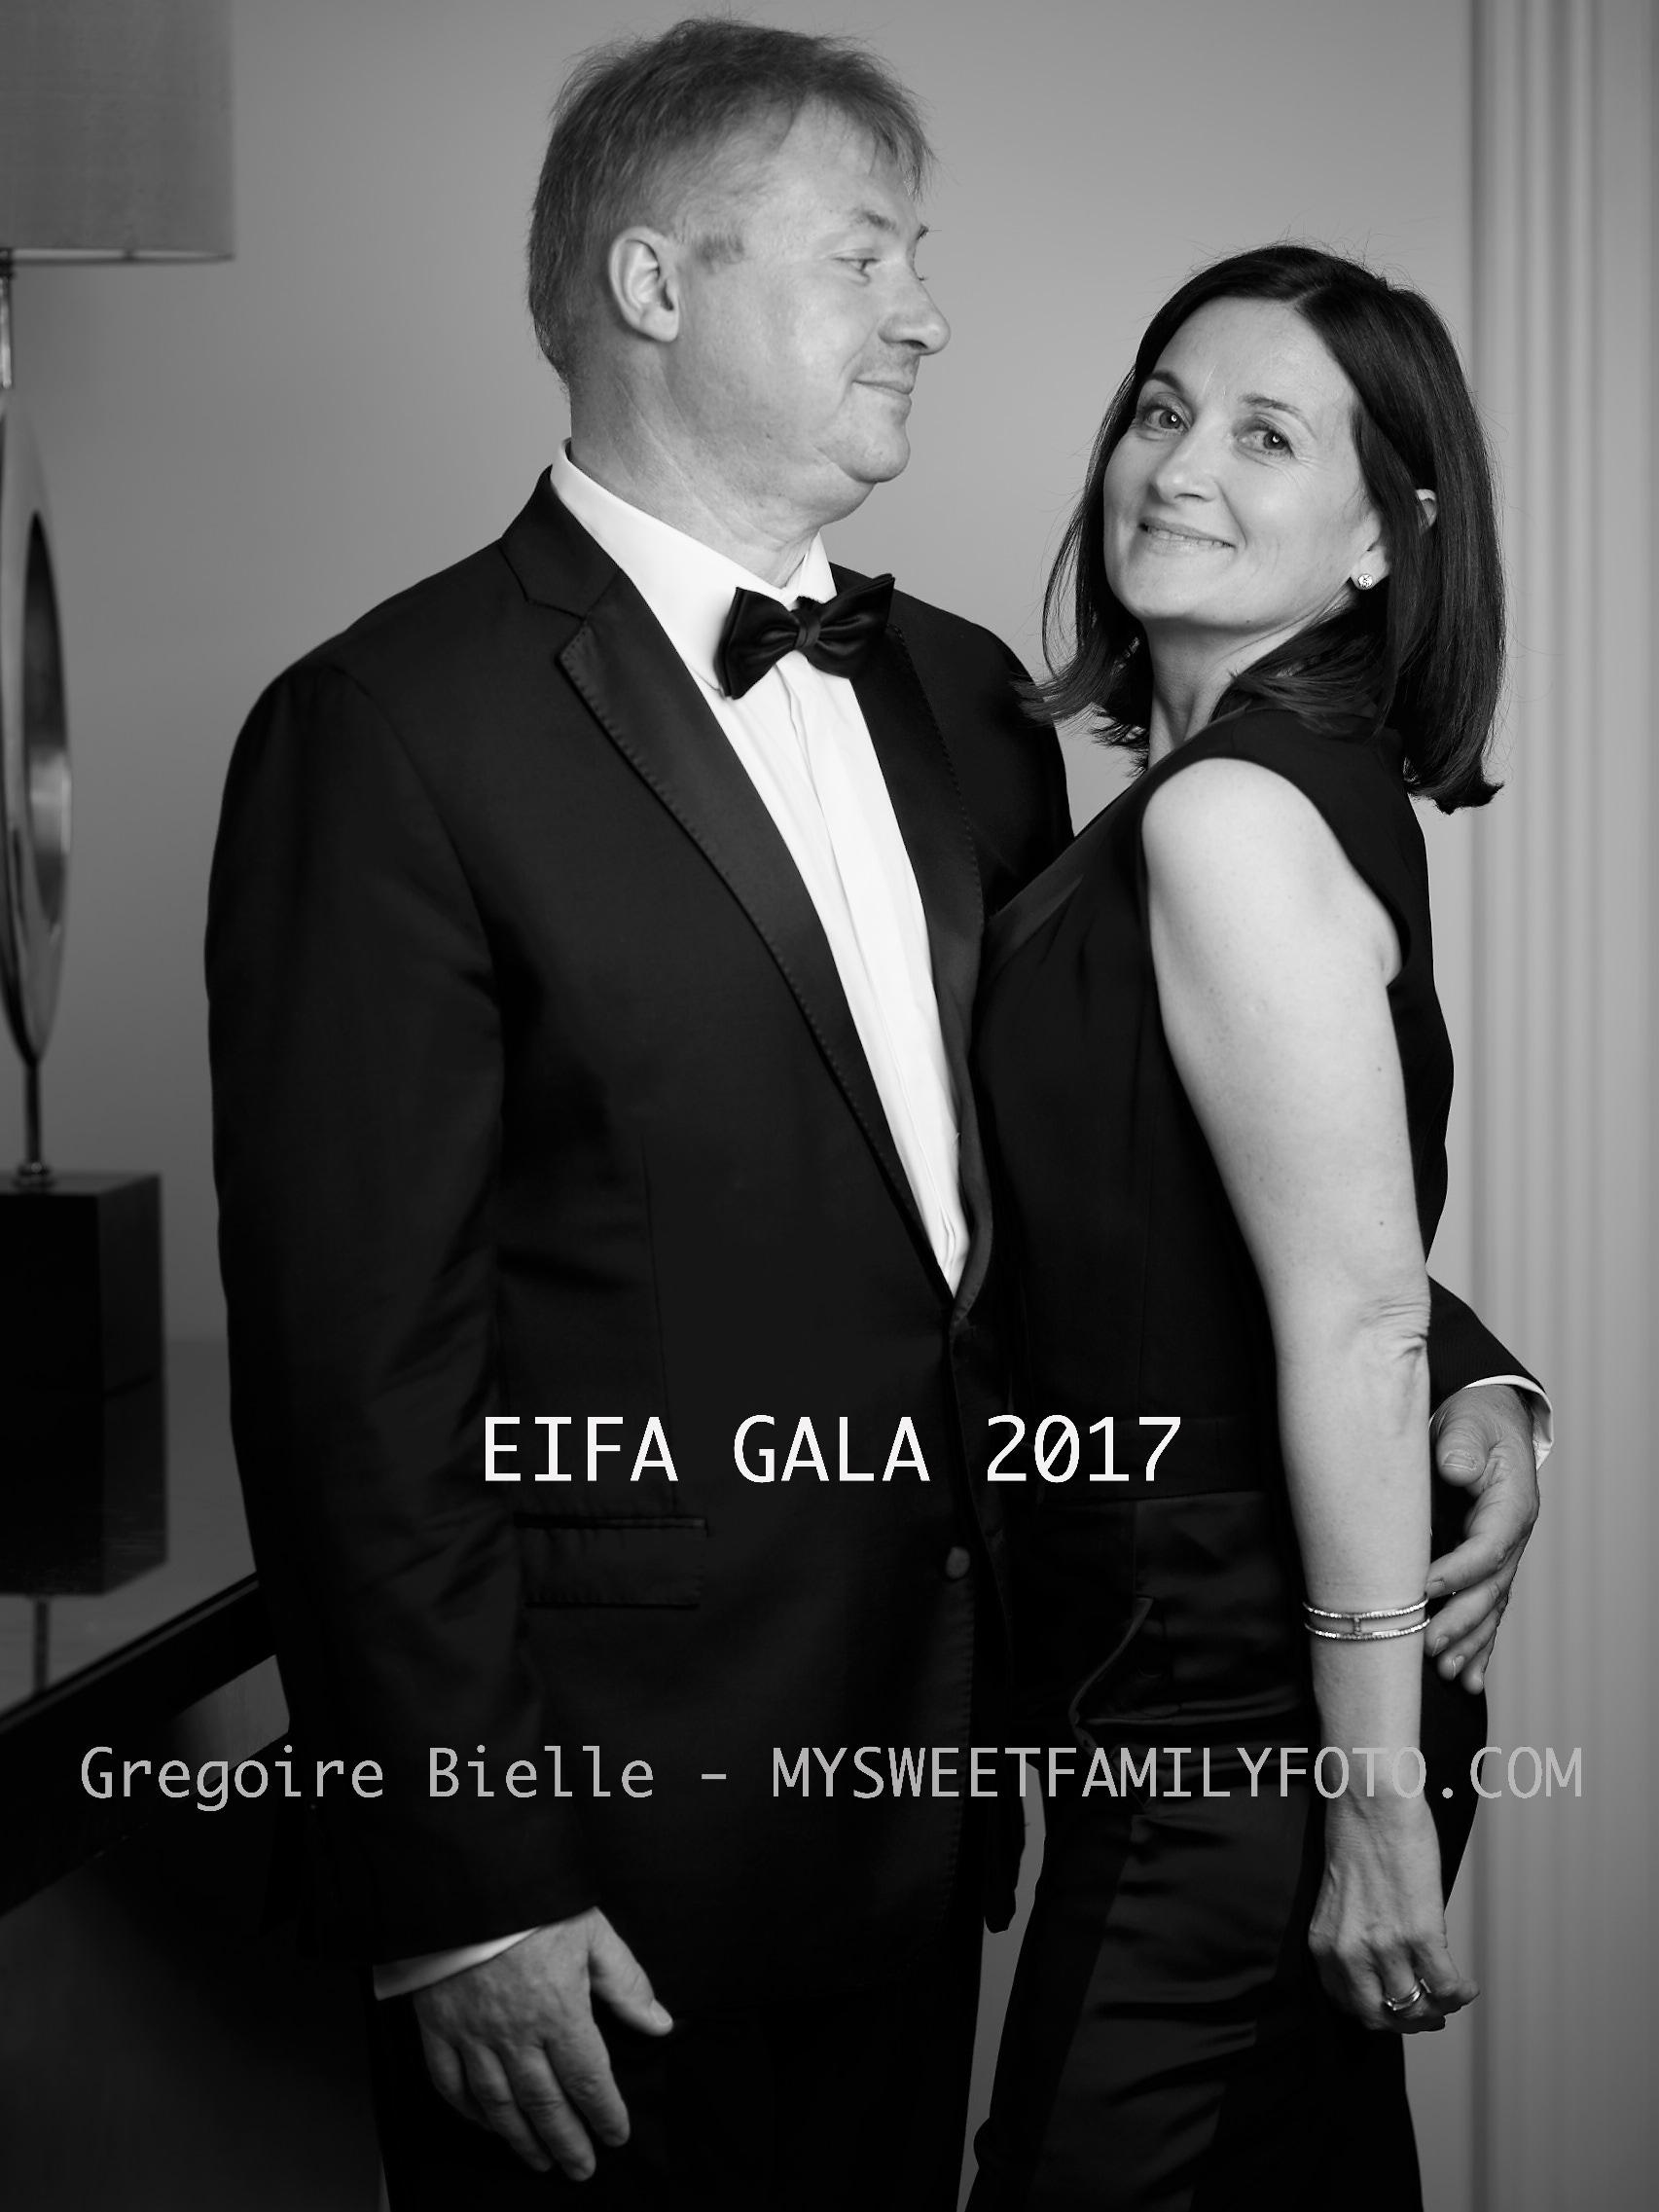 EIFA GALA 1210.jpg